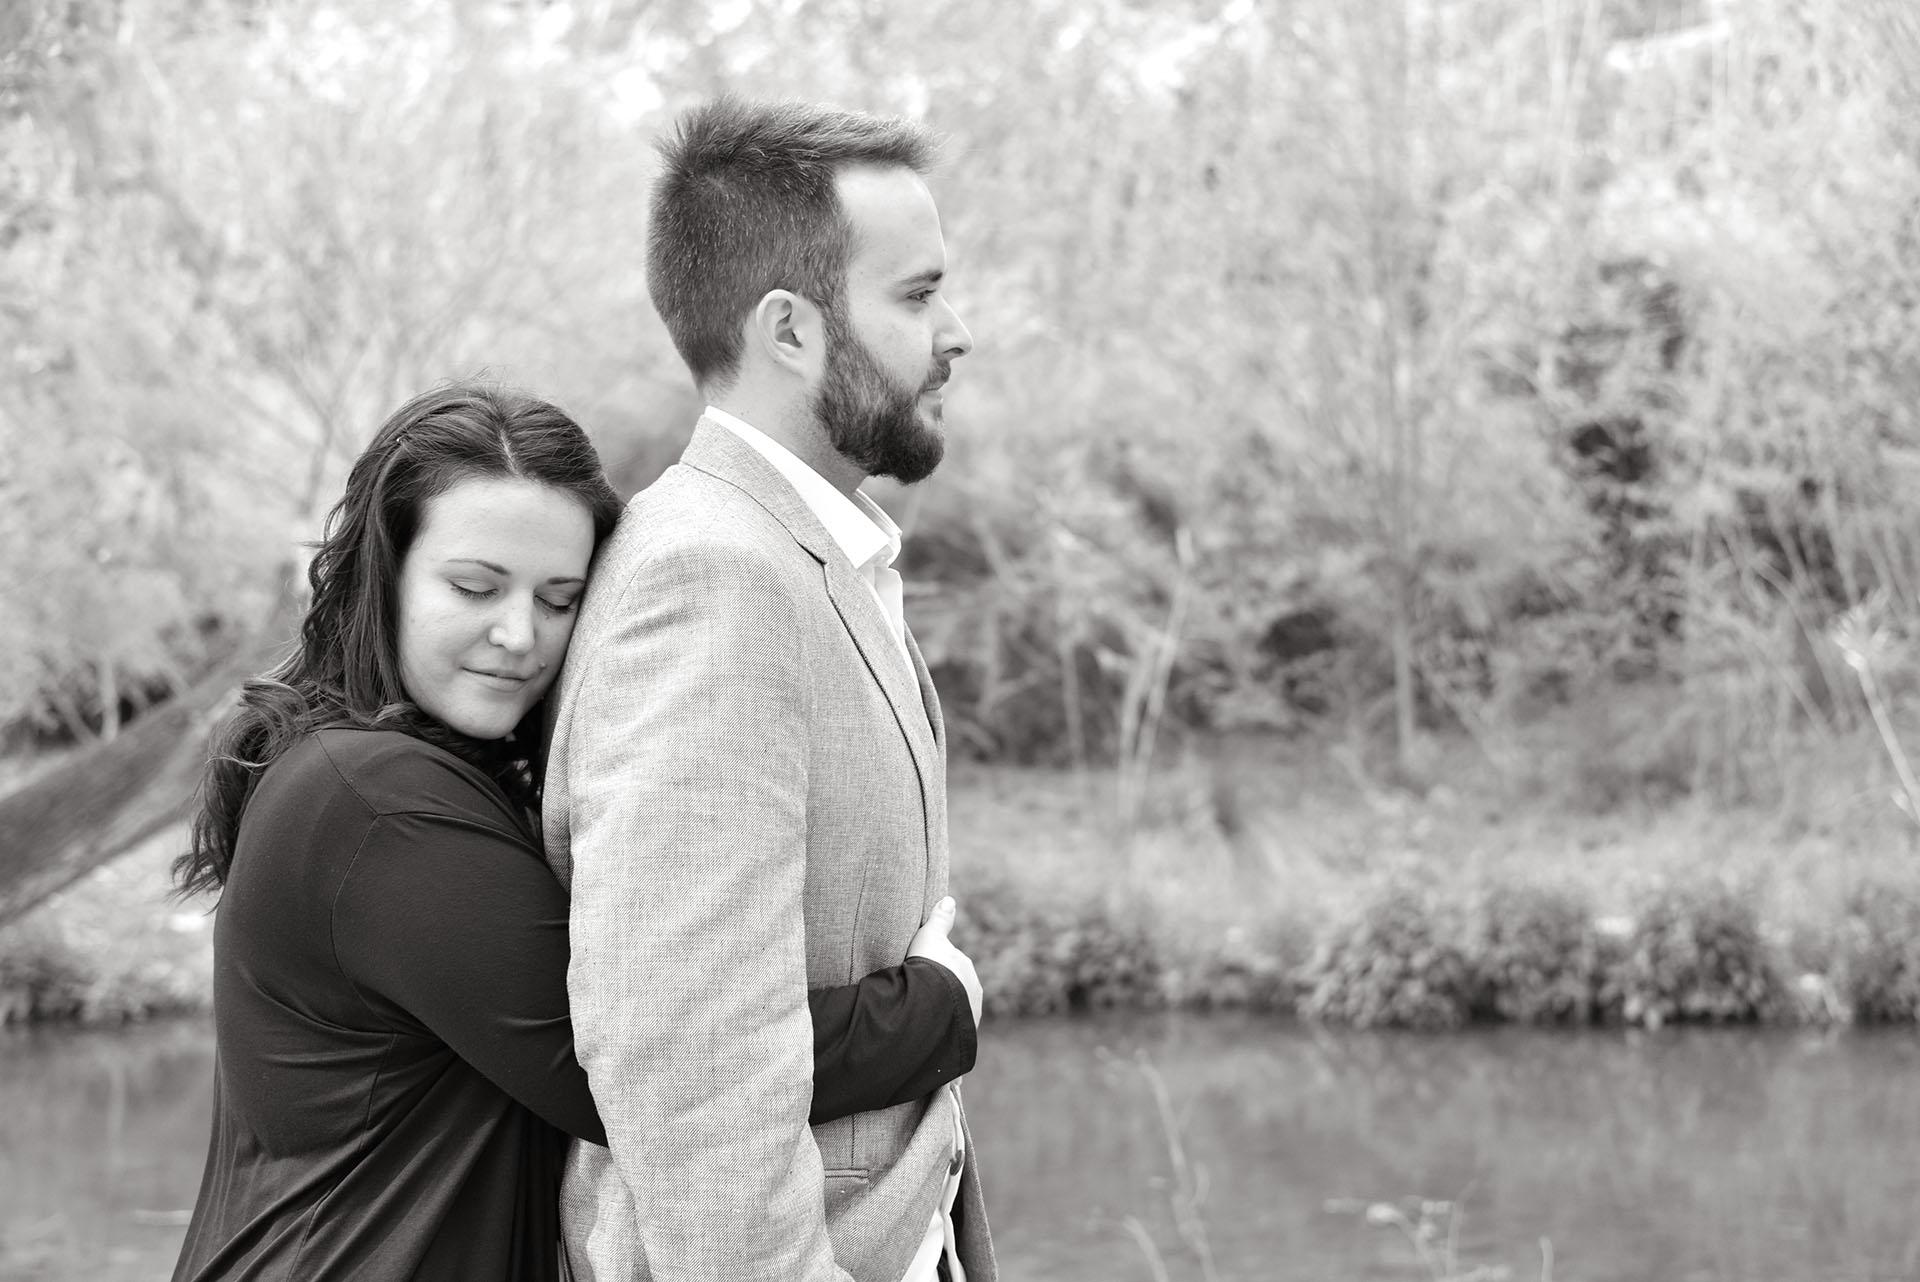 Itziar & Jorge - Fotografía de boda